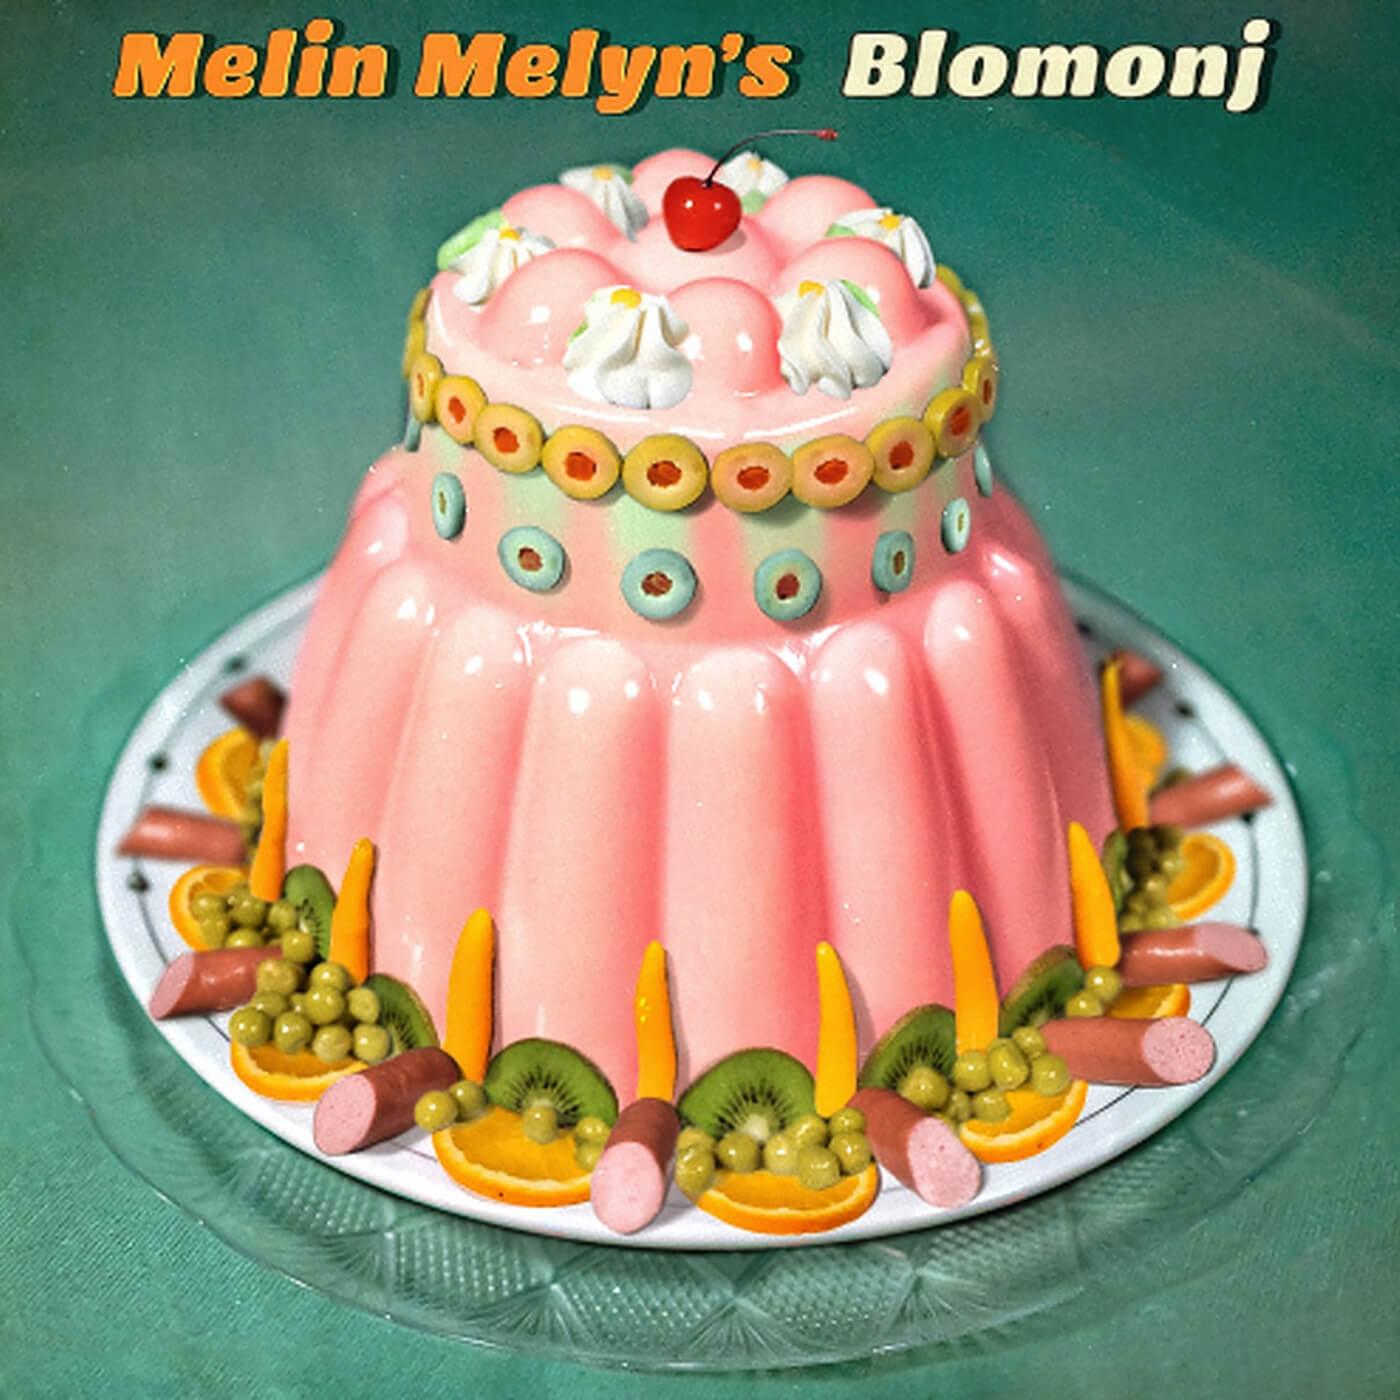 Melin Melyn - Blomonj